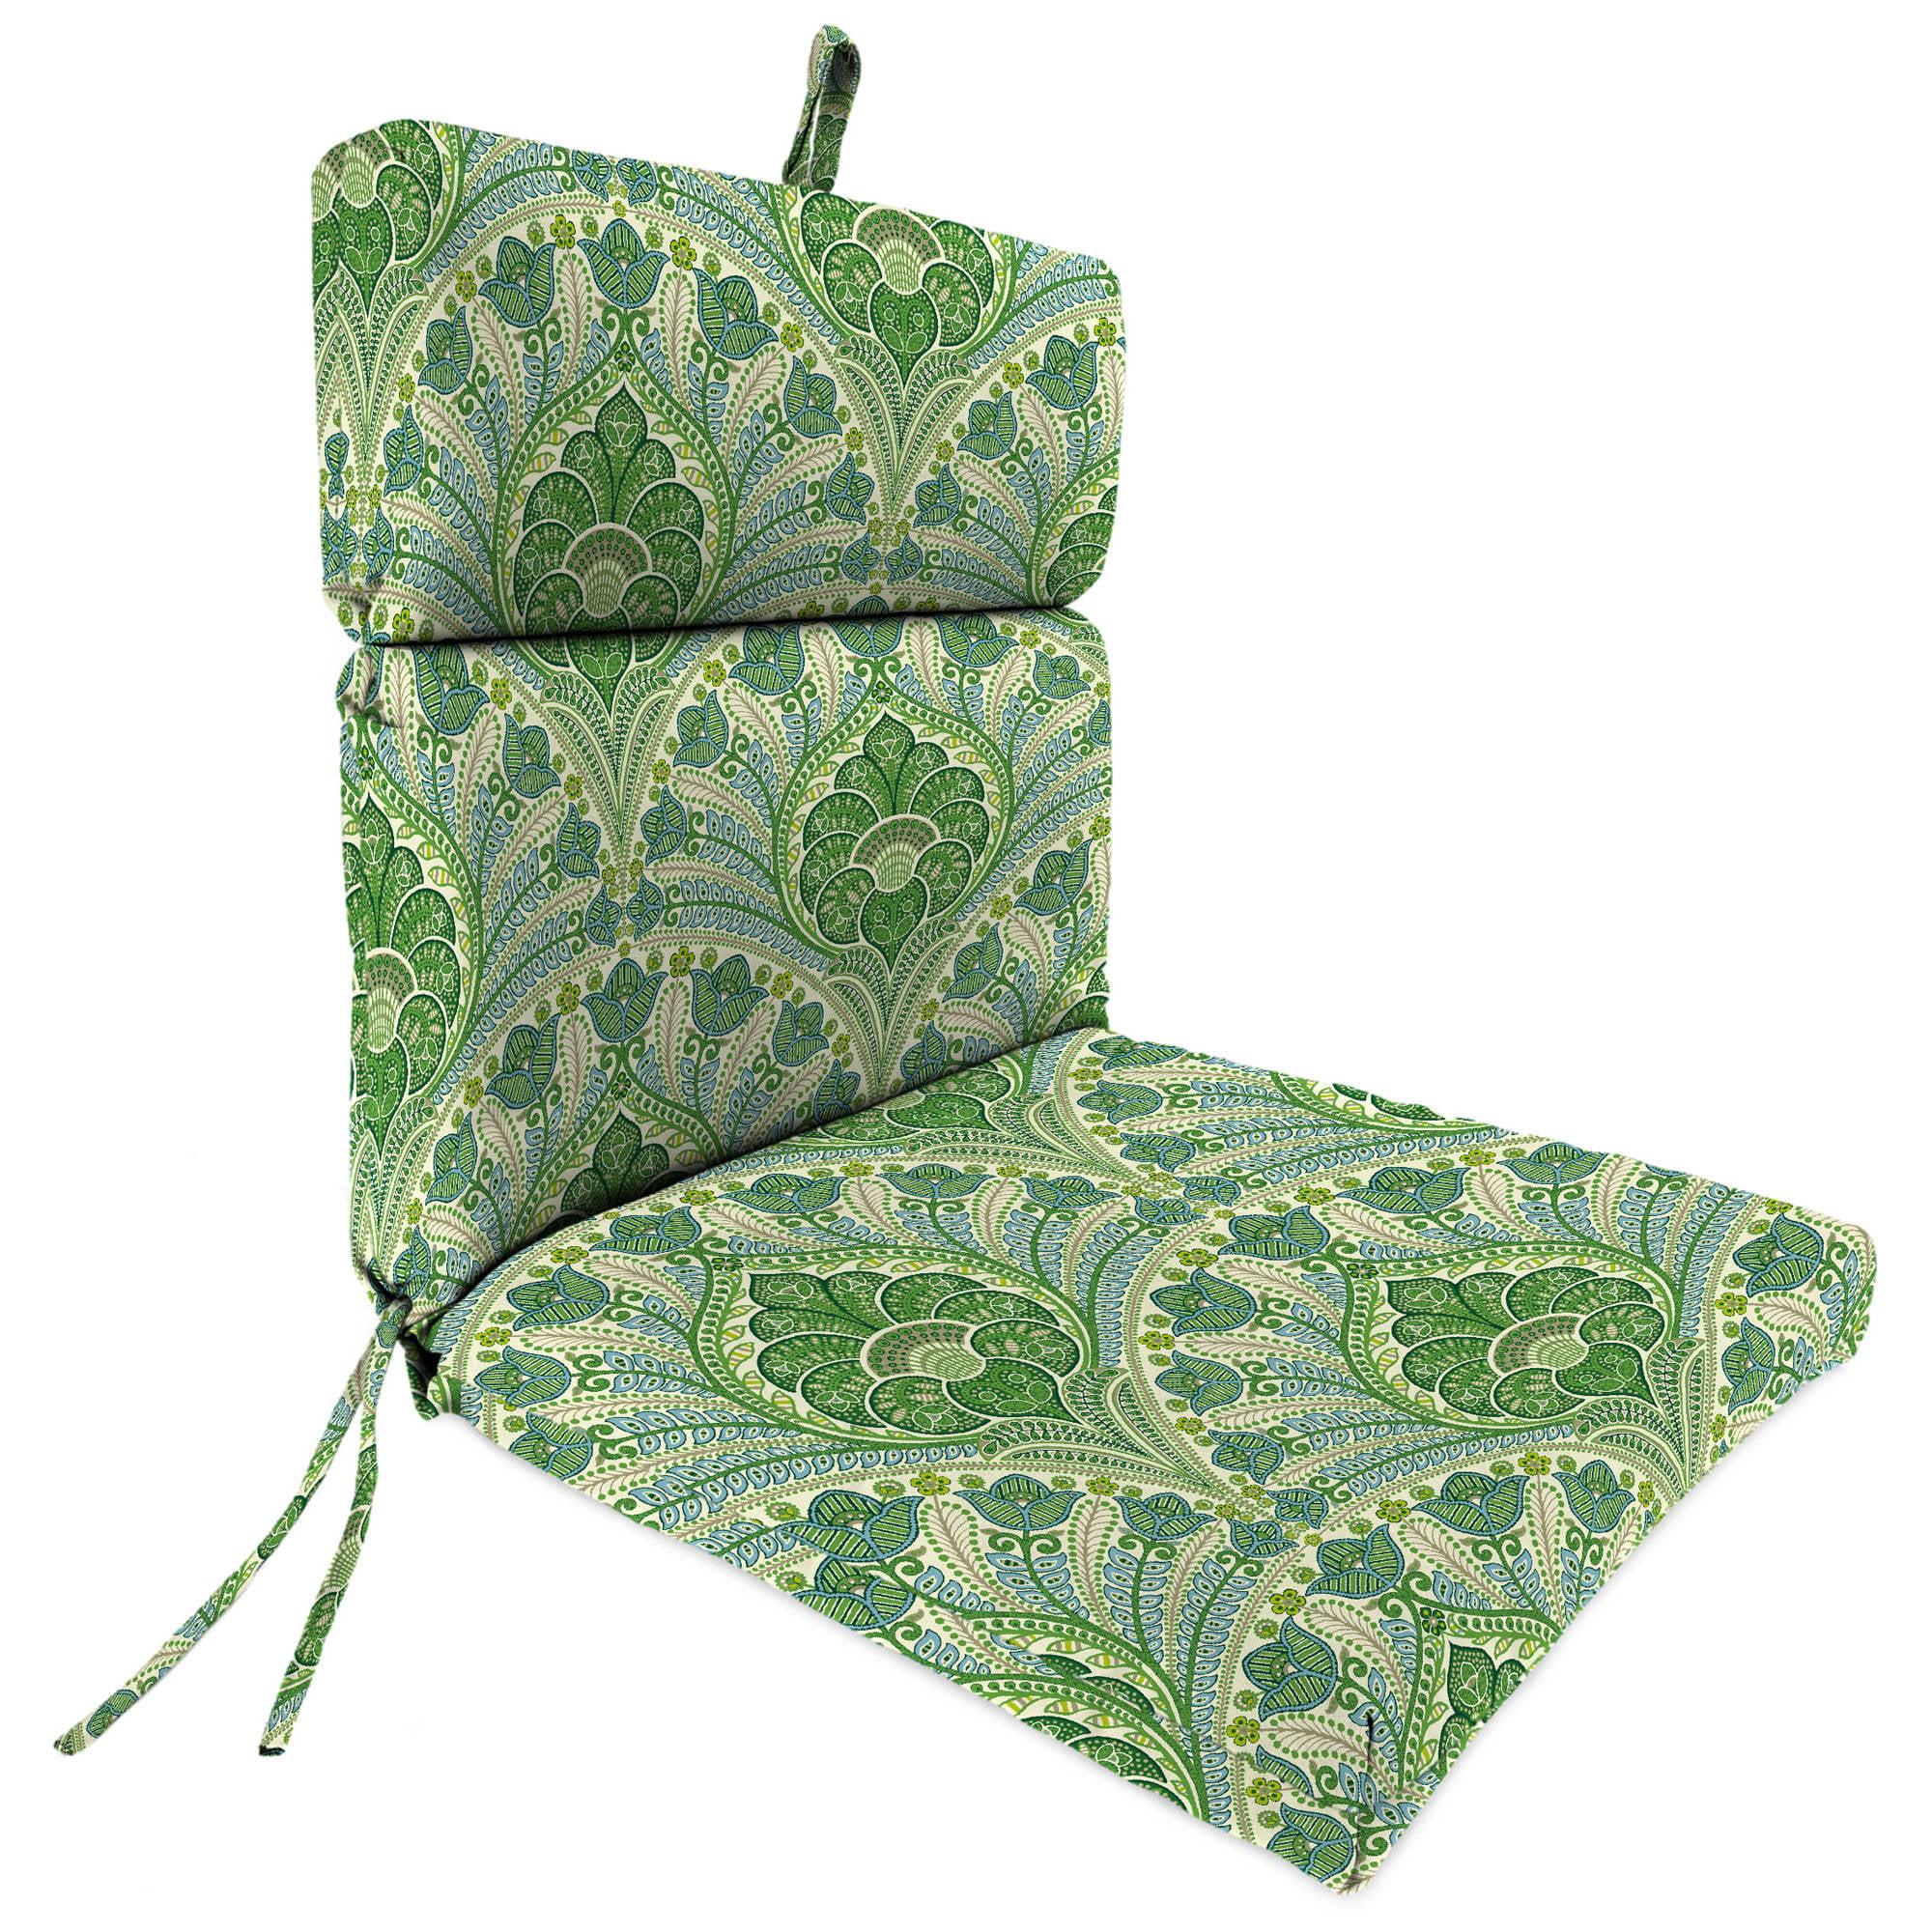 Jordan Manufacturing Outdoor Patio Chair Cushion, Crescent Beach Jungle